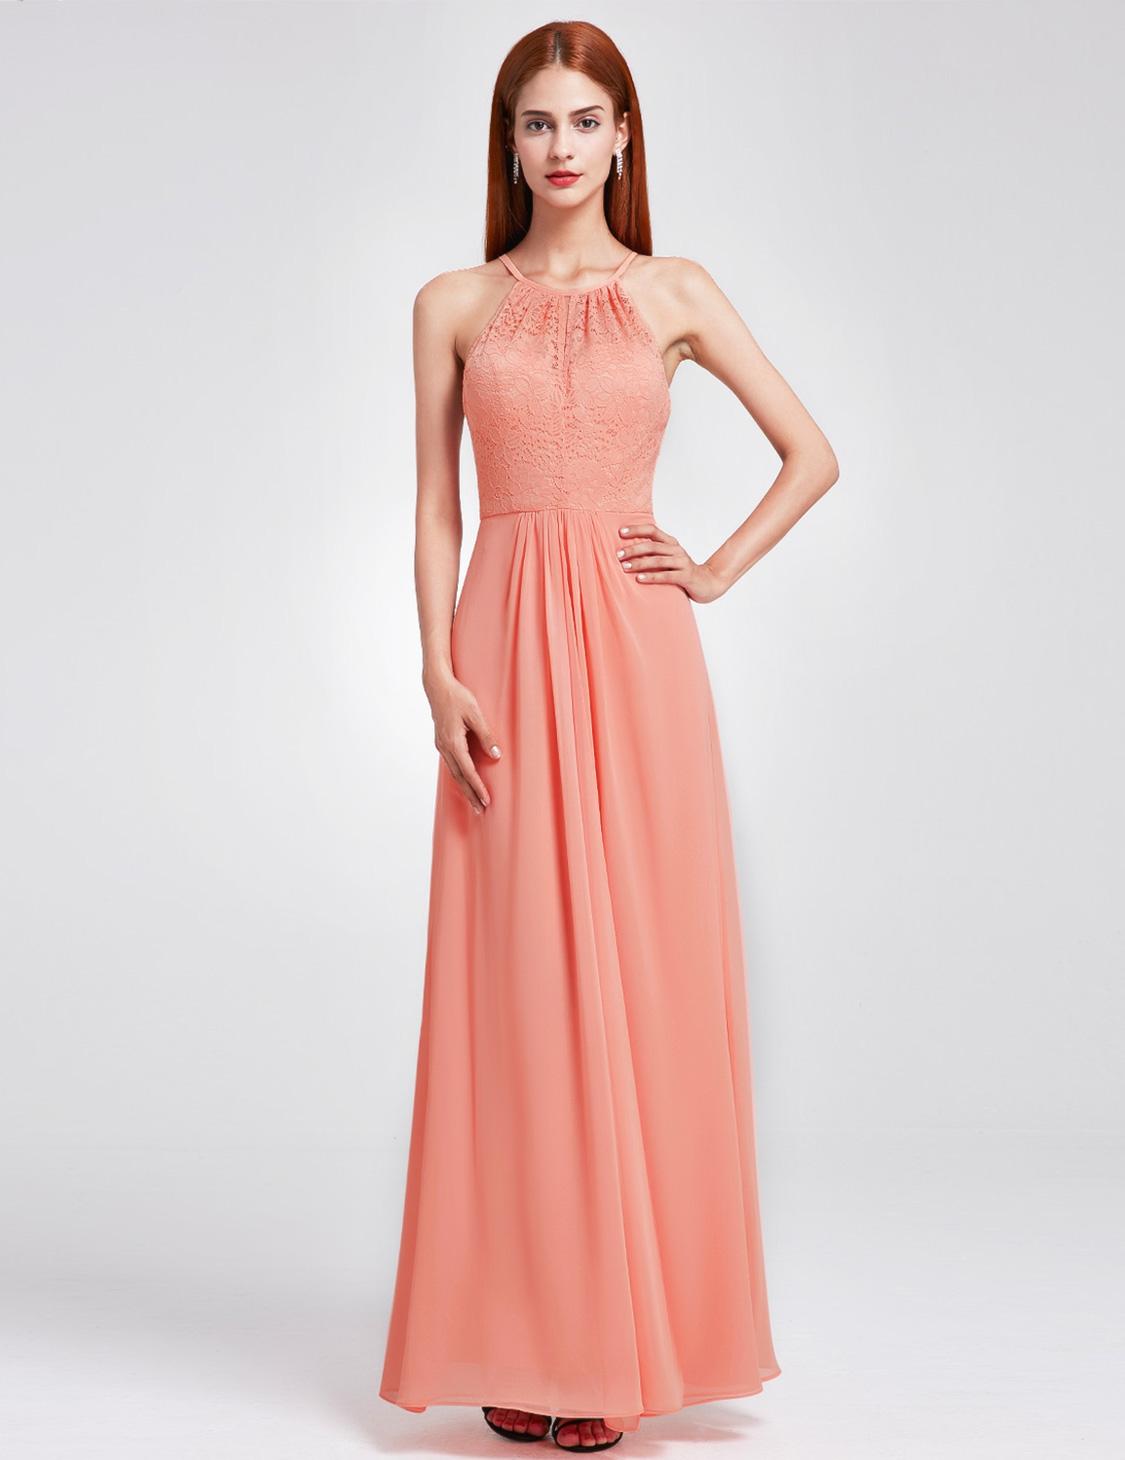 Ever-Pretty Long Bridesmaid Dresses Prom Ball Gown Evening Dress 08982 | EBay